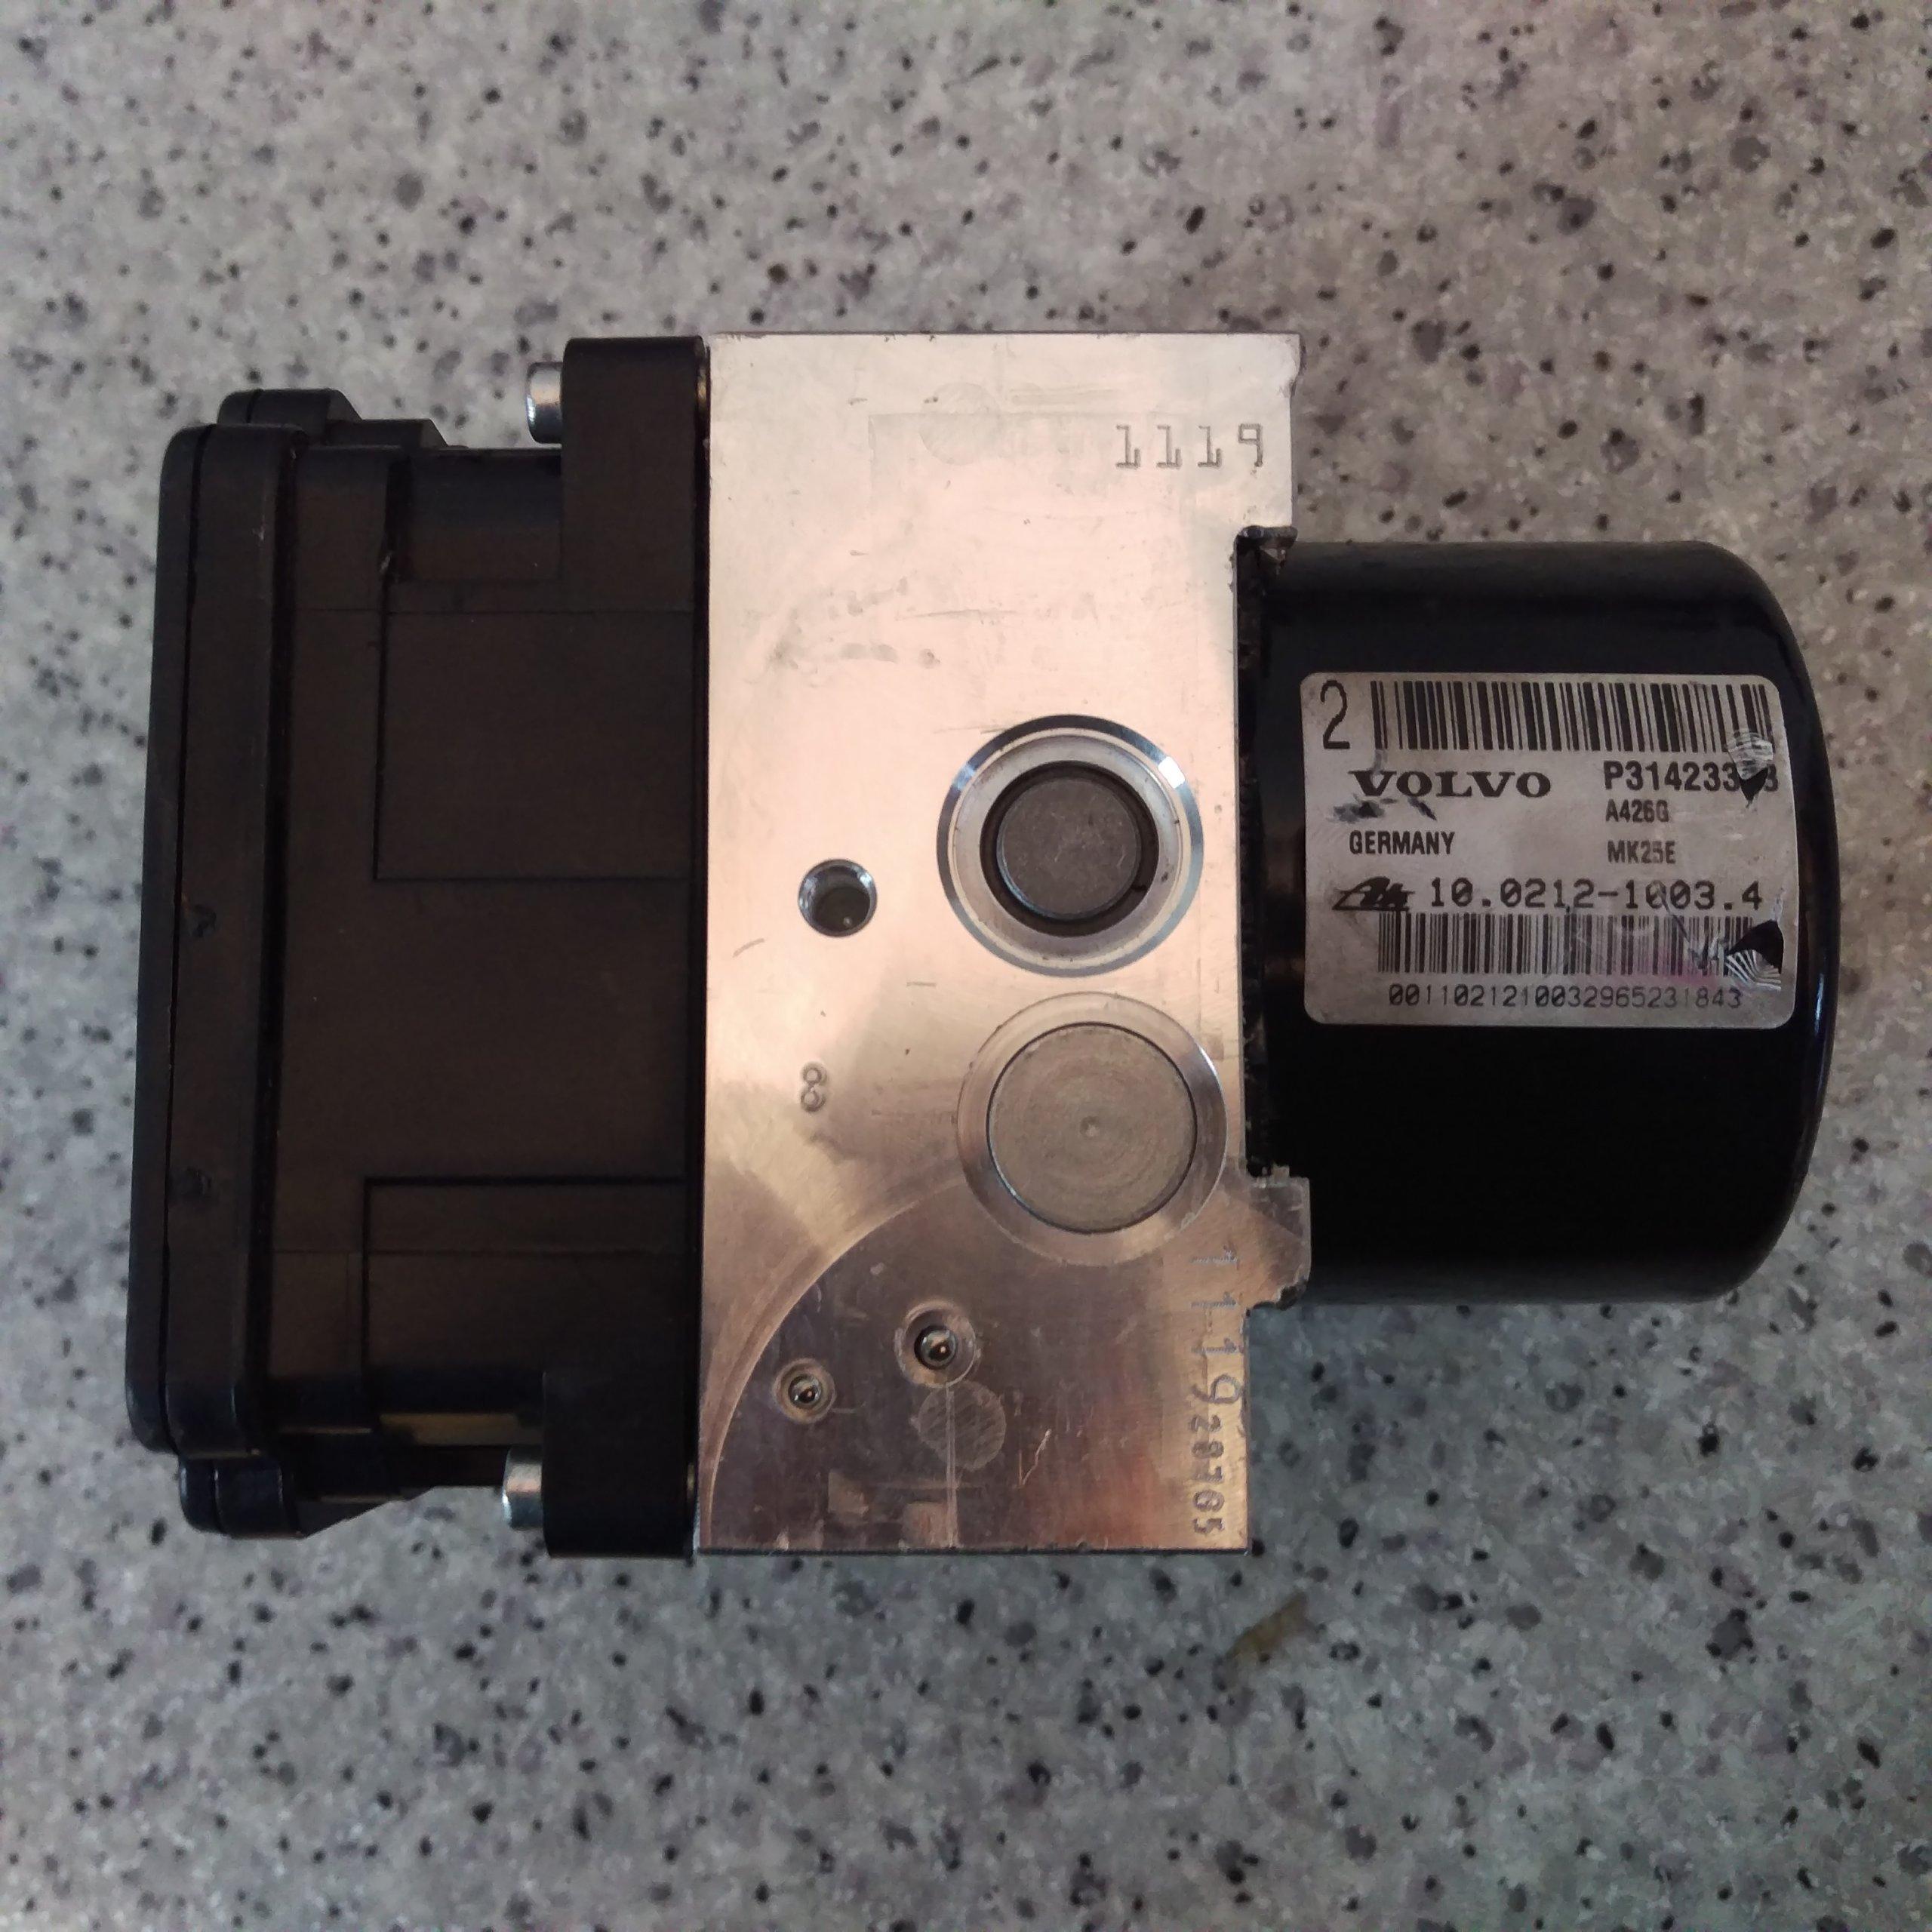 Riadiaca jednotka modul ABS ESP na Volvo XC60 P31423348 28.5262-5830.3